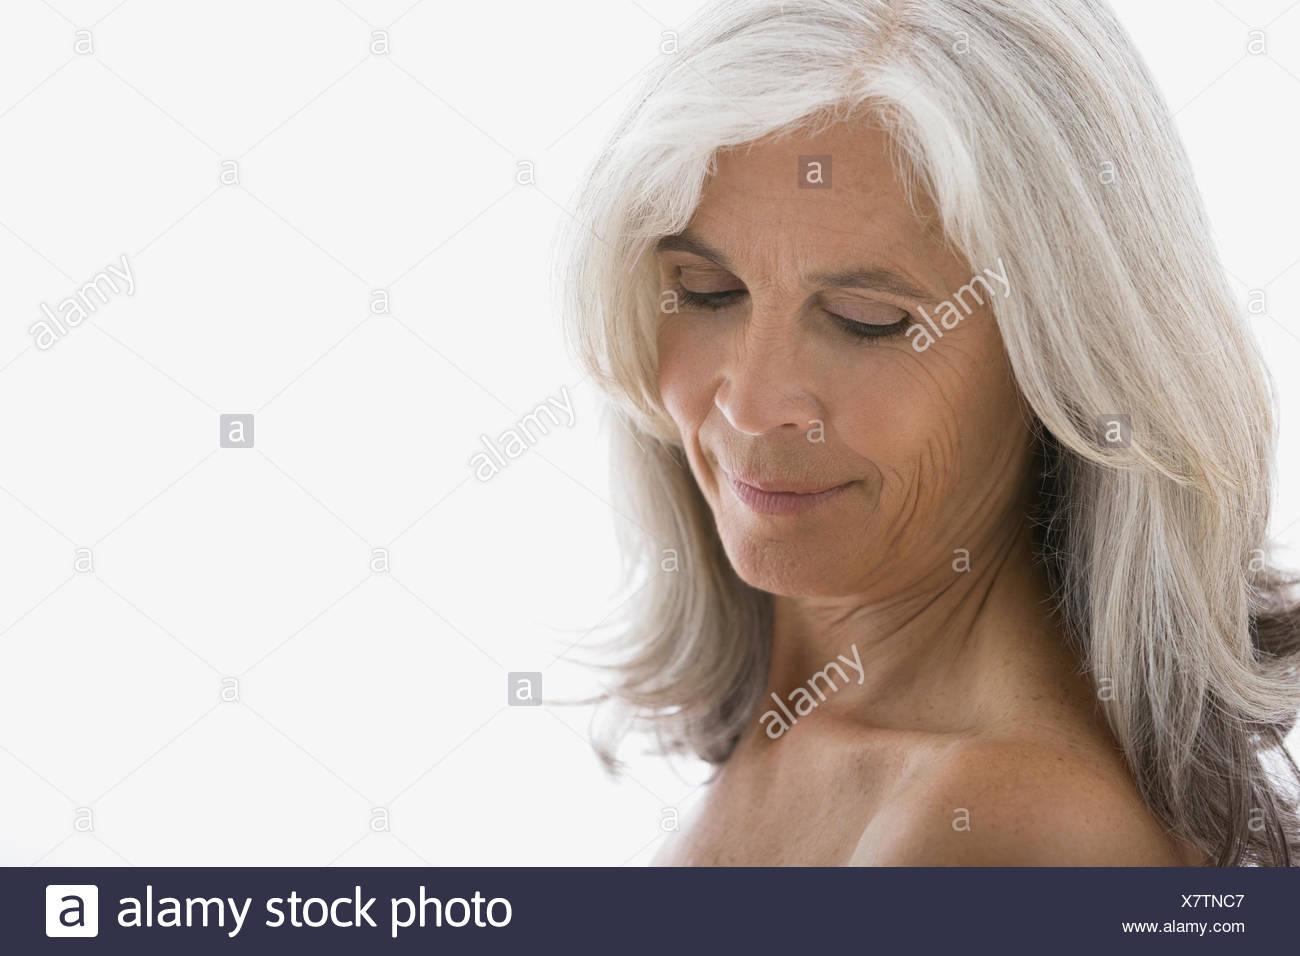 Senior woman with poitrine nue à la bas Photo Stock